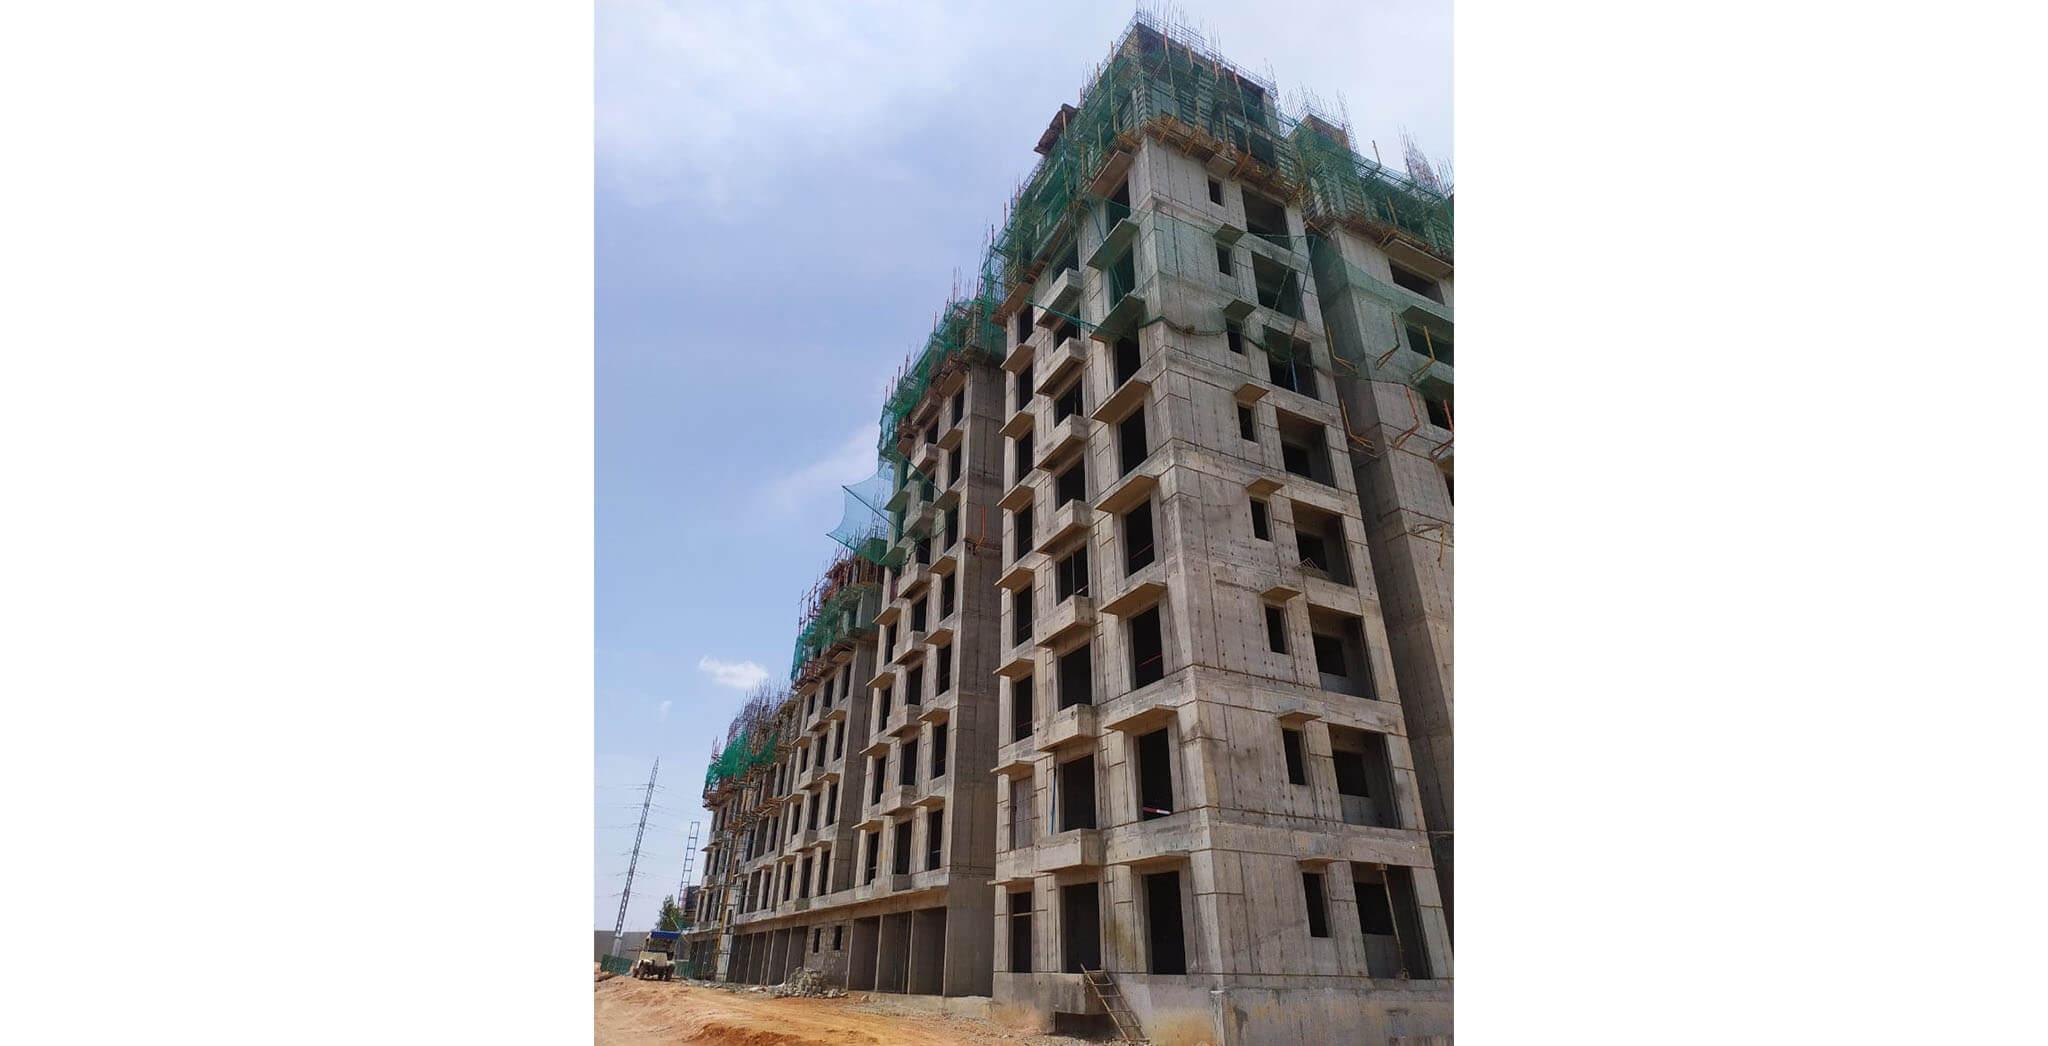 Jun 2021 - Helio: Wing C—On commencement of seventh floor slab